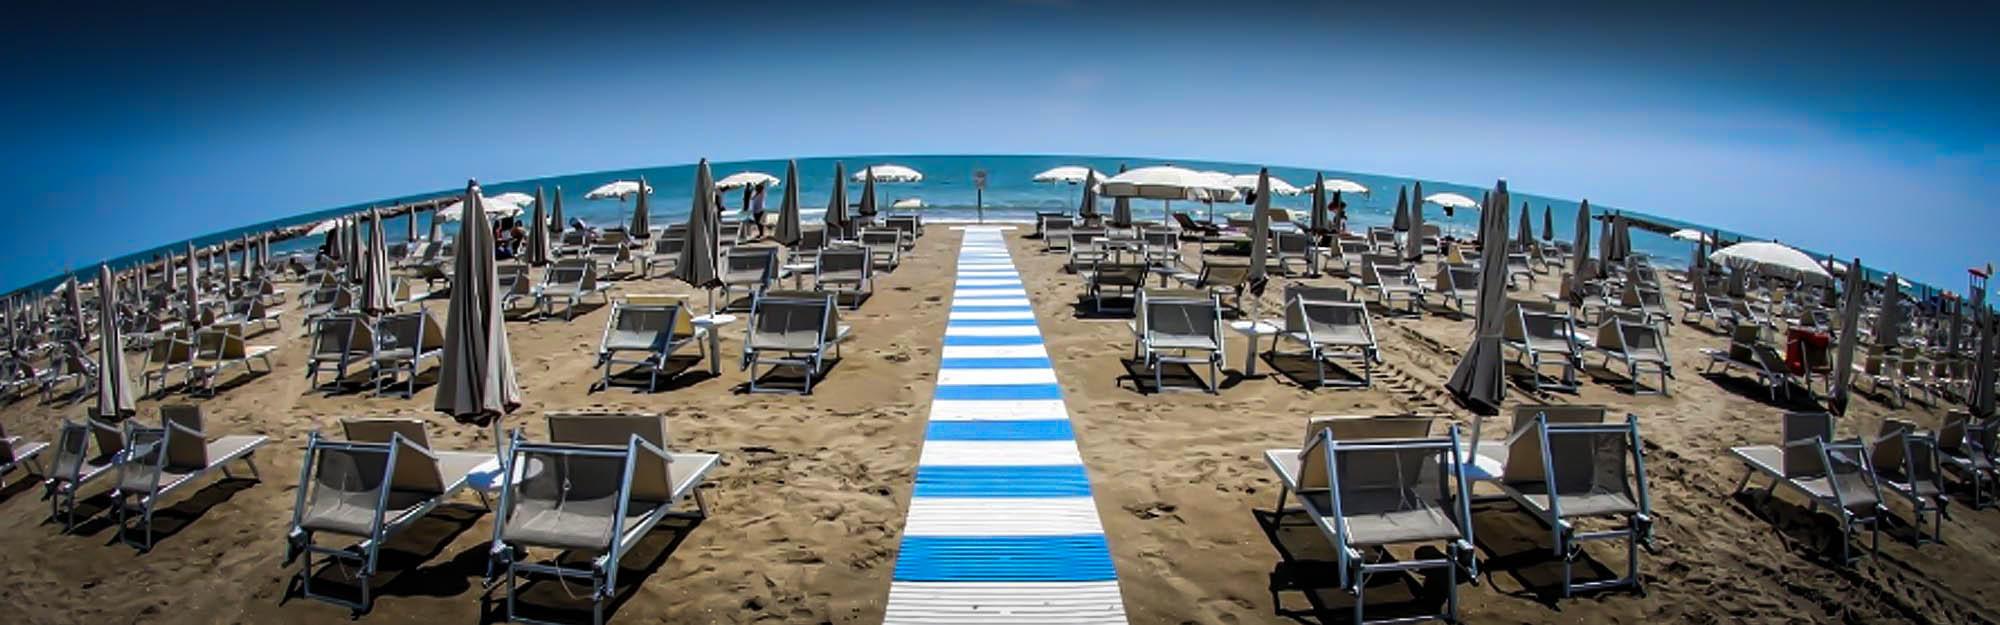 Spiaggia-Mete-Beach-Hotel-Marilu-Eraclea